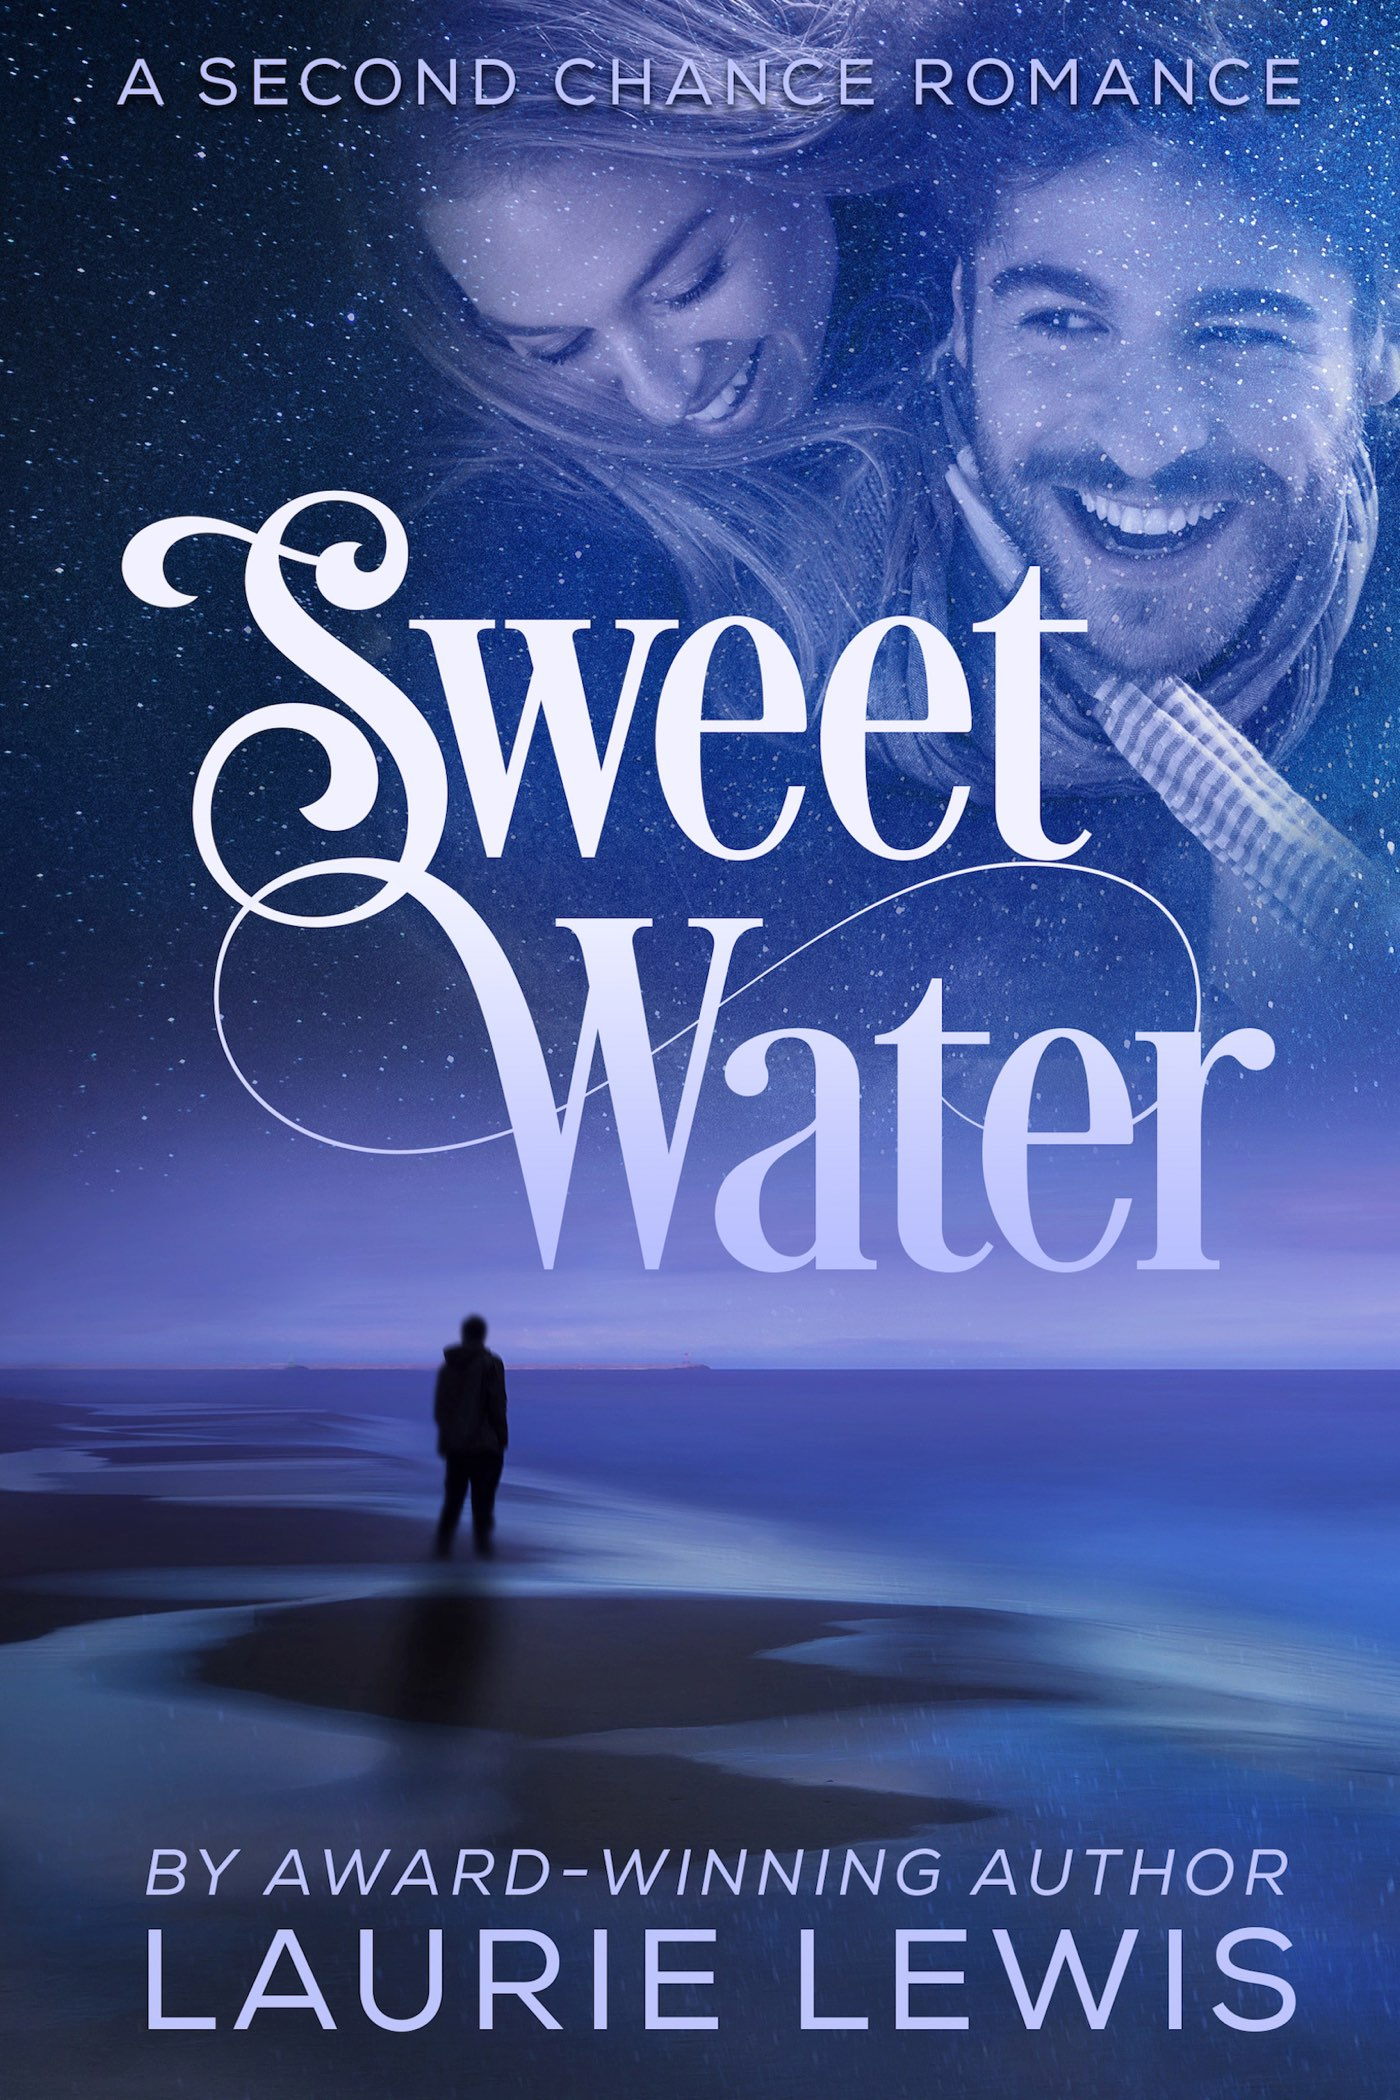 SWEET-WATER